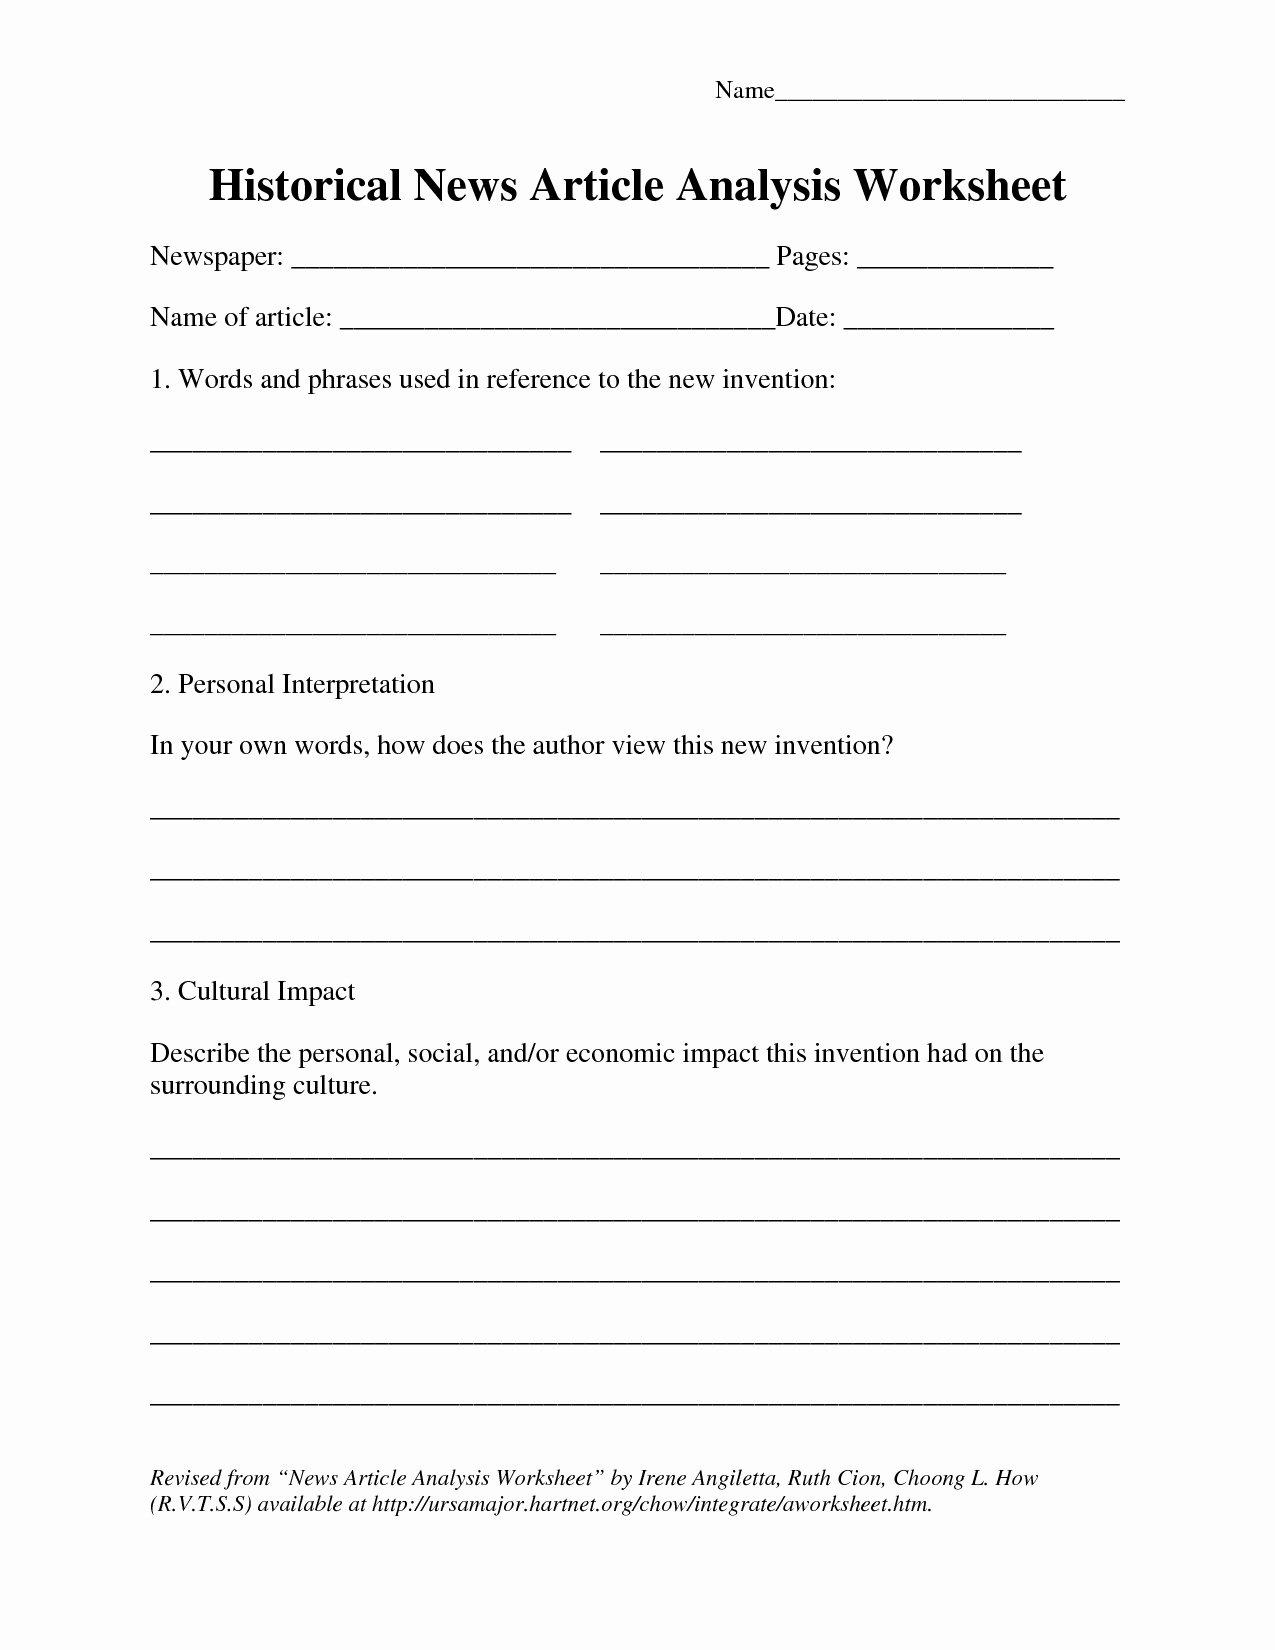 Current event Worksheet High School Best Of Current events Paper Worksheet